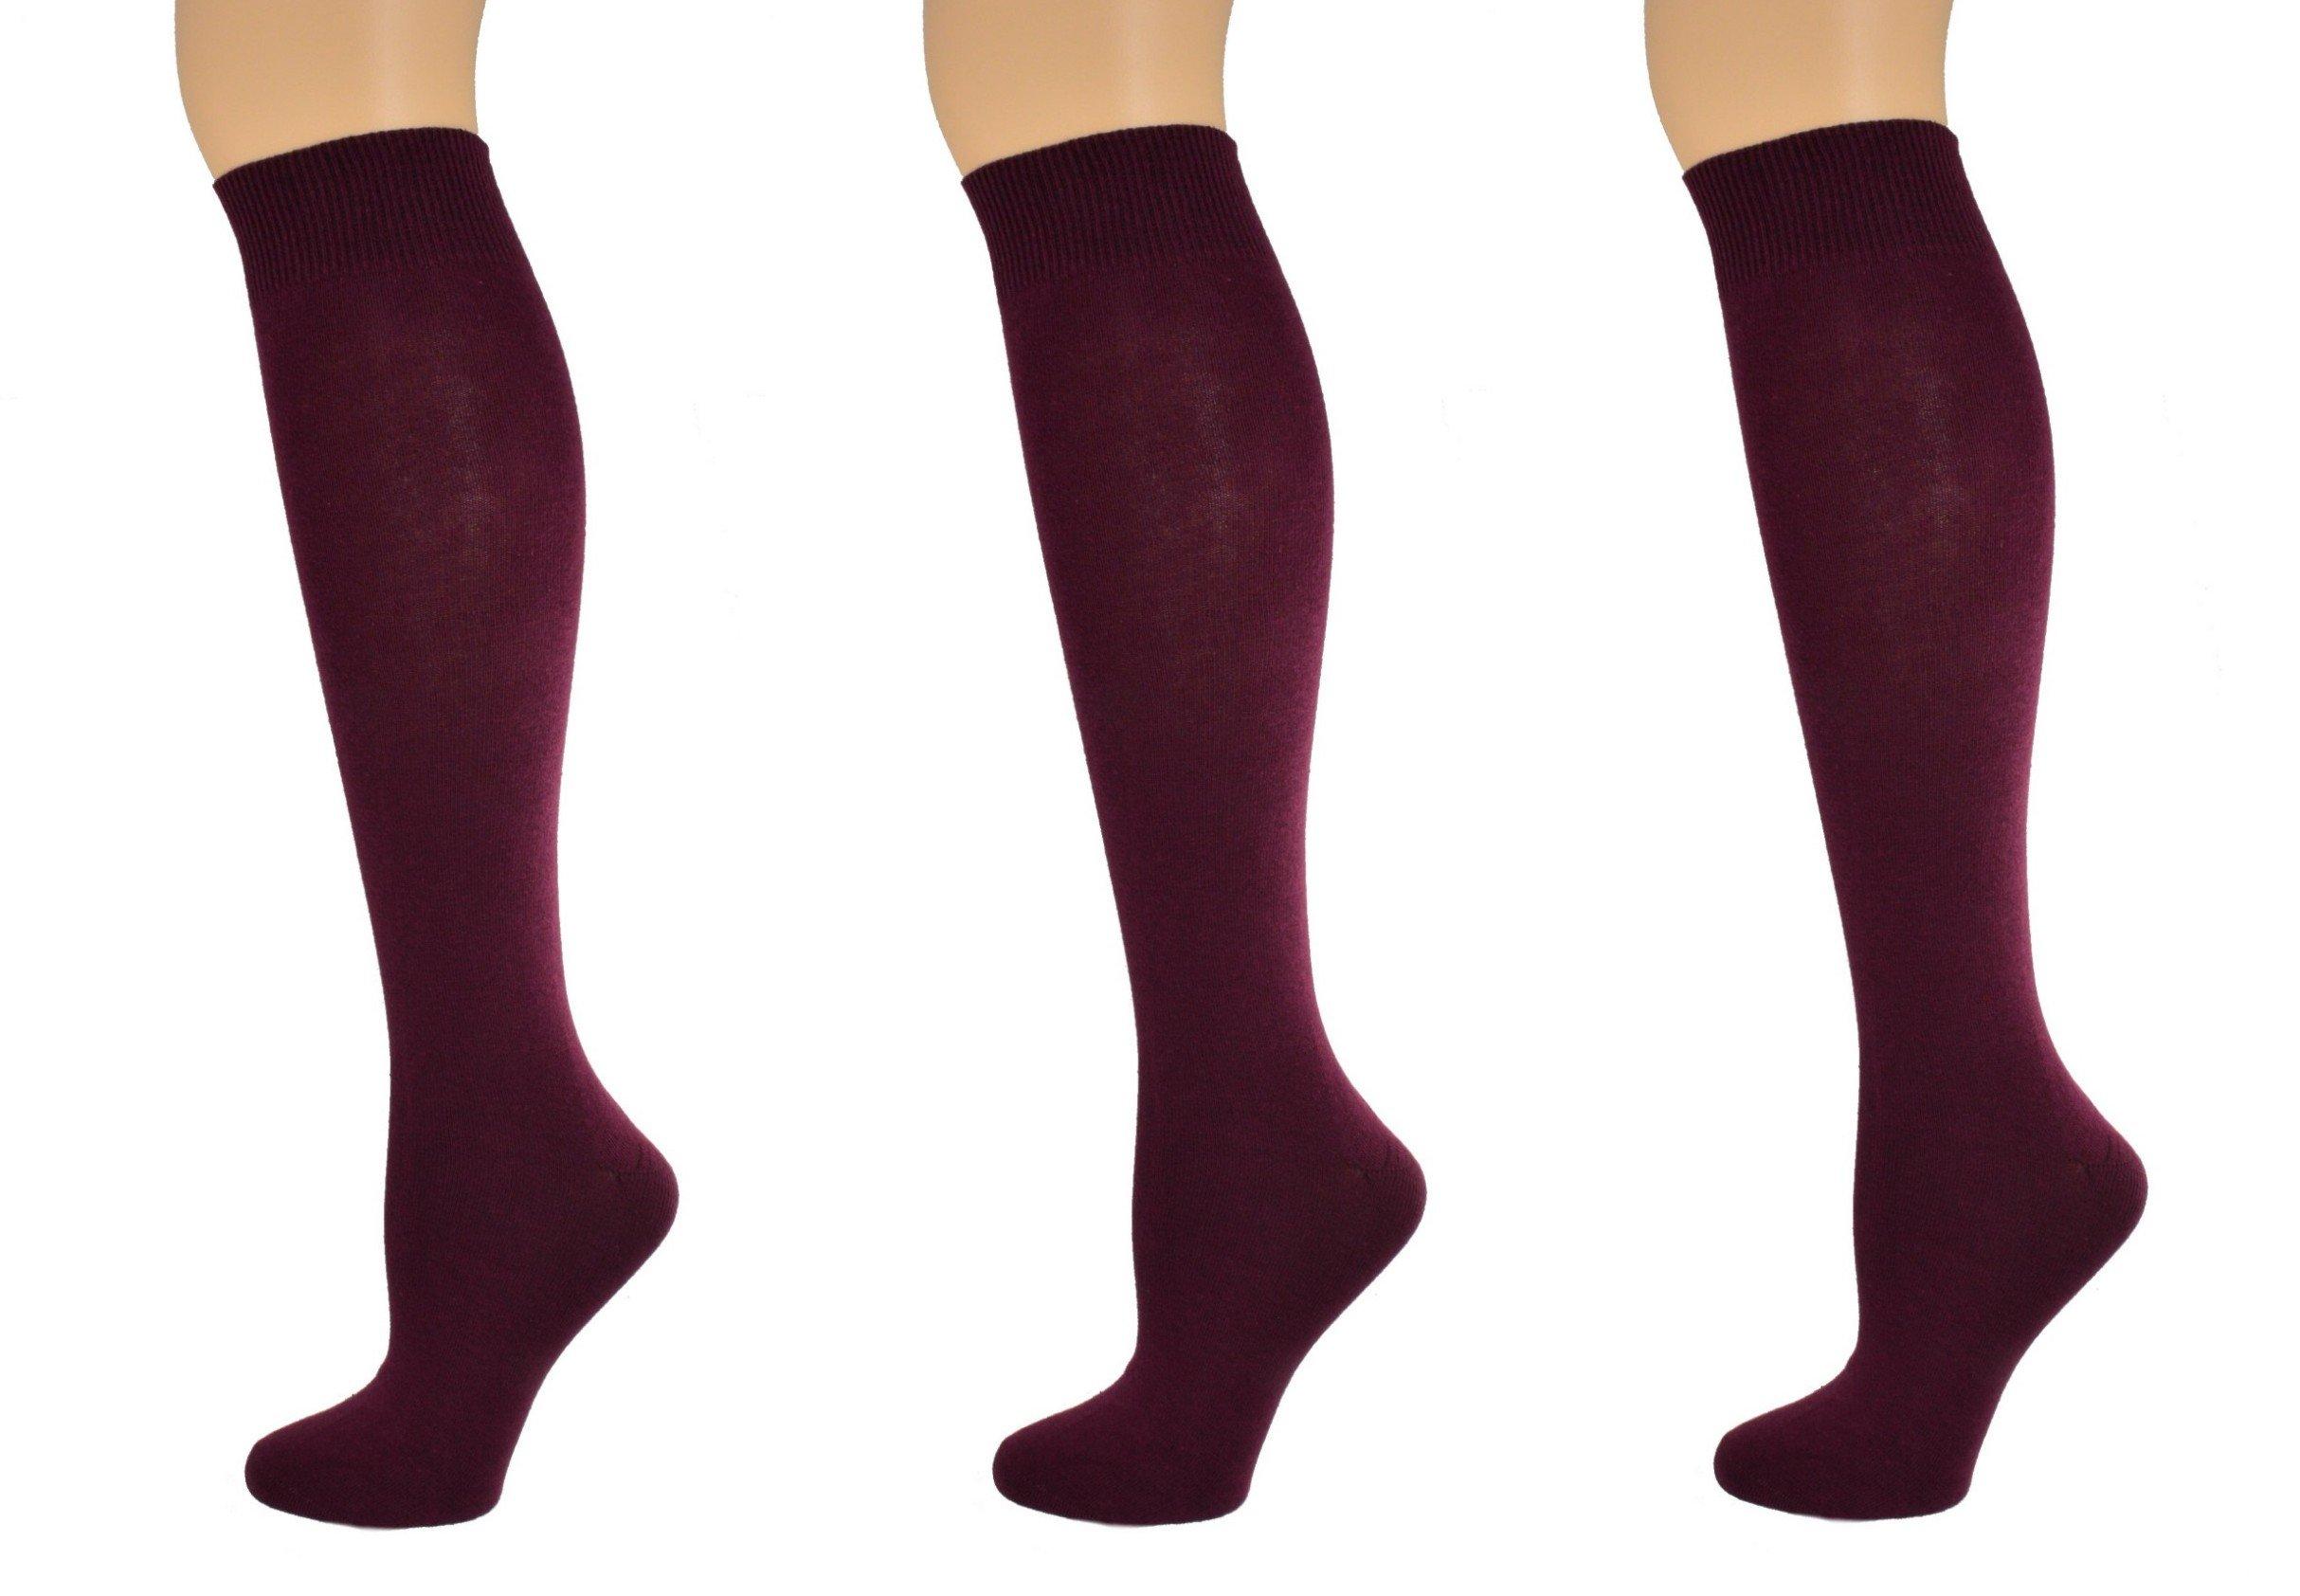 Sierra Socks Girl's School Uniform Knee High 3 pair Pack Cotton Socks G7200 (M/Shoe Size 12-6, Maroon)